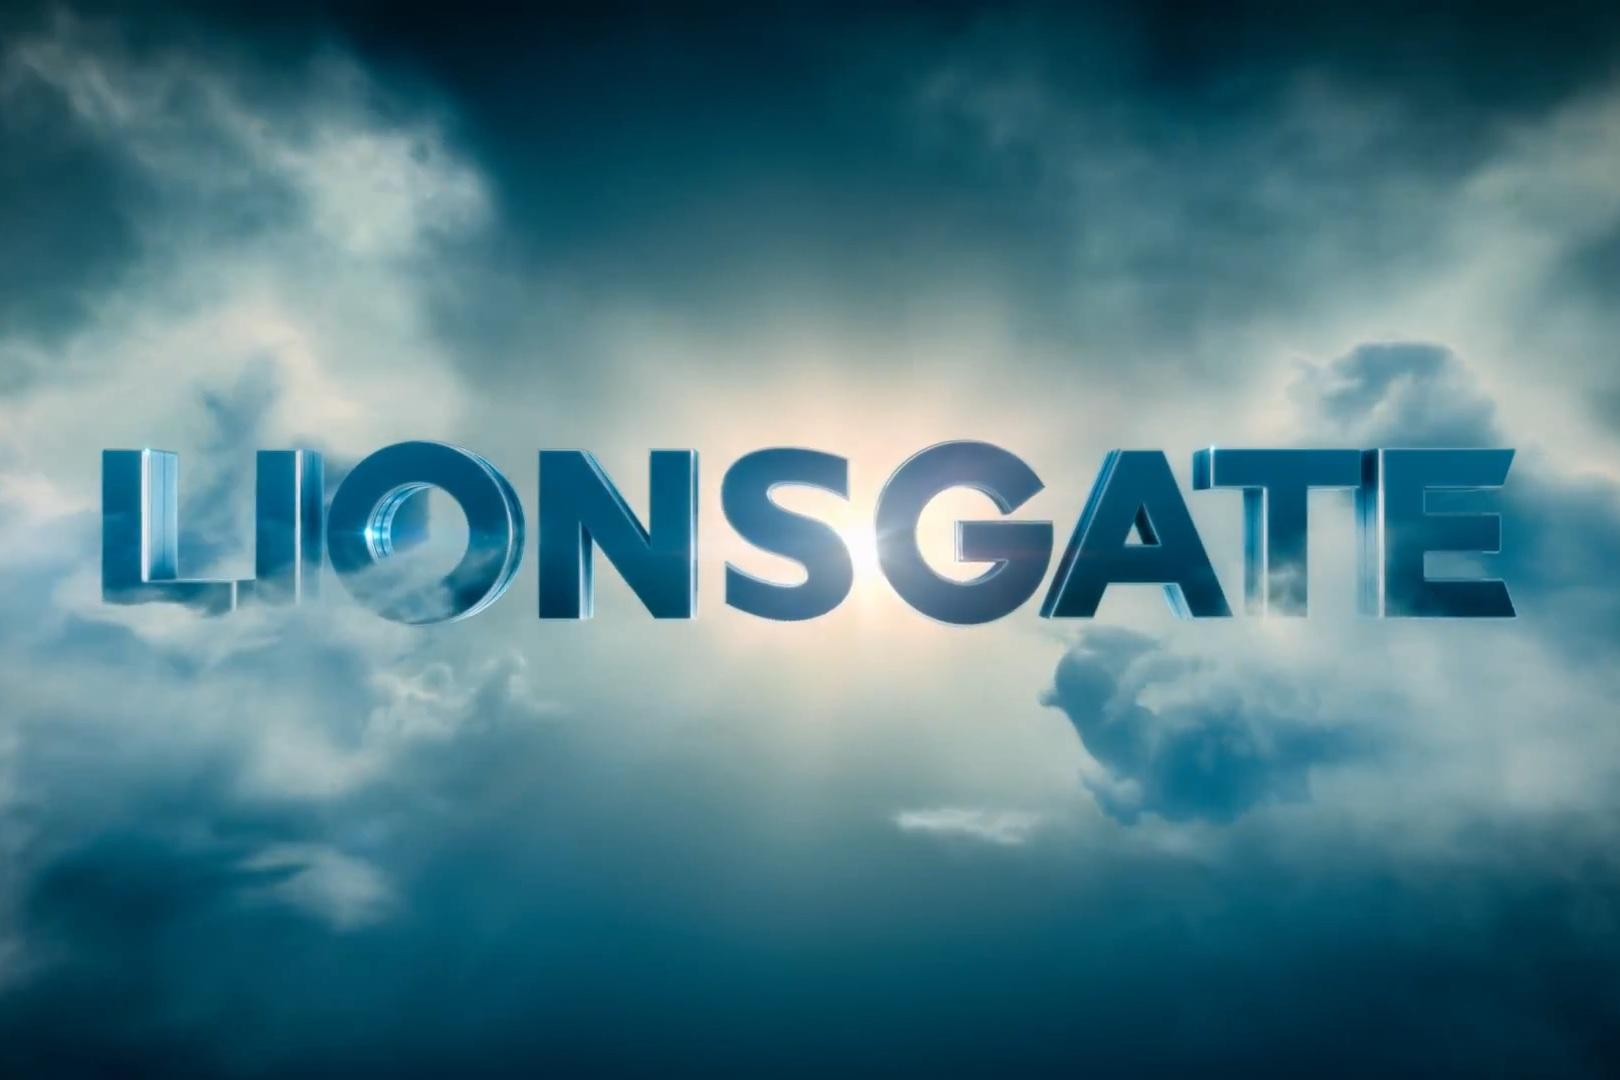 Lionsgate_2013.jpg